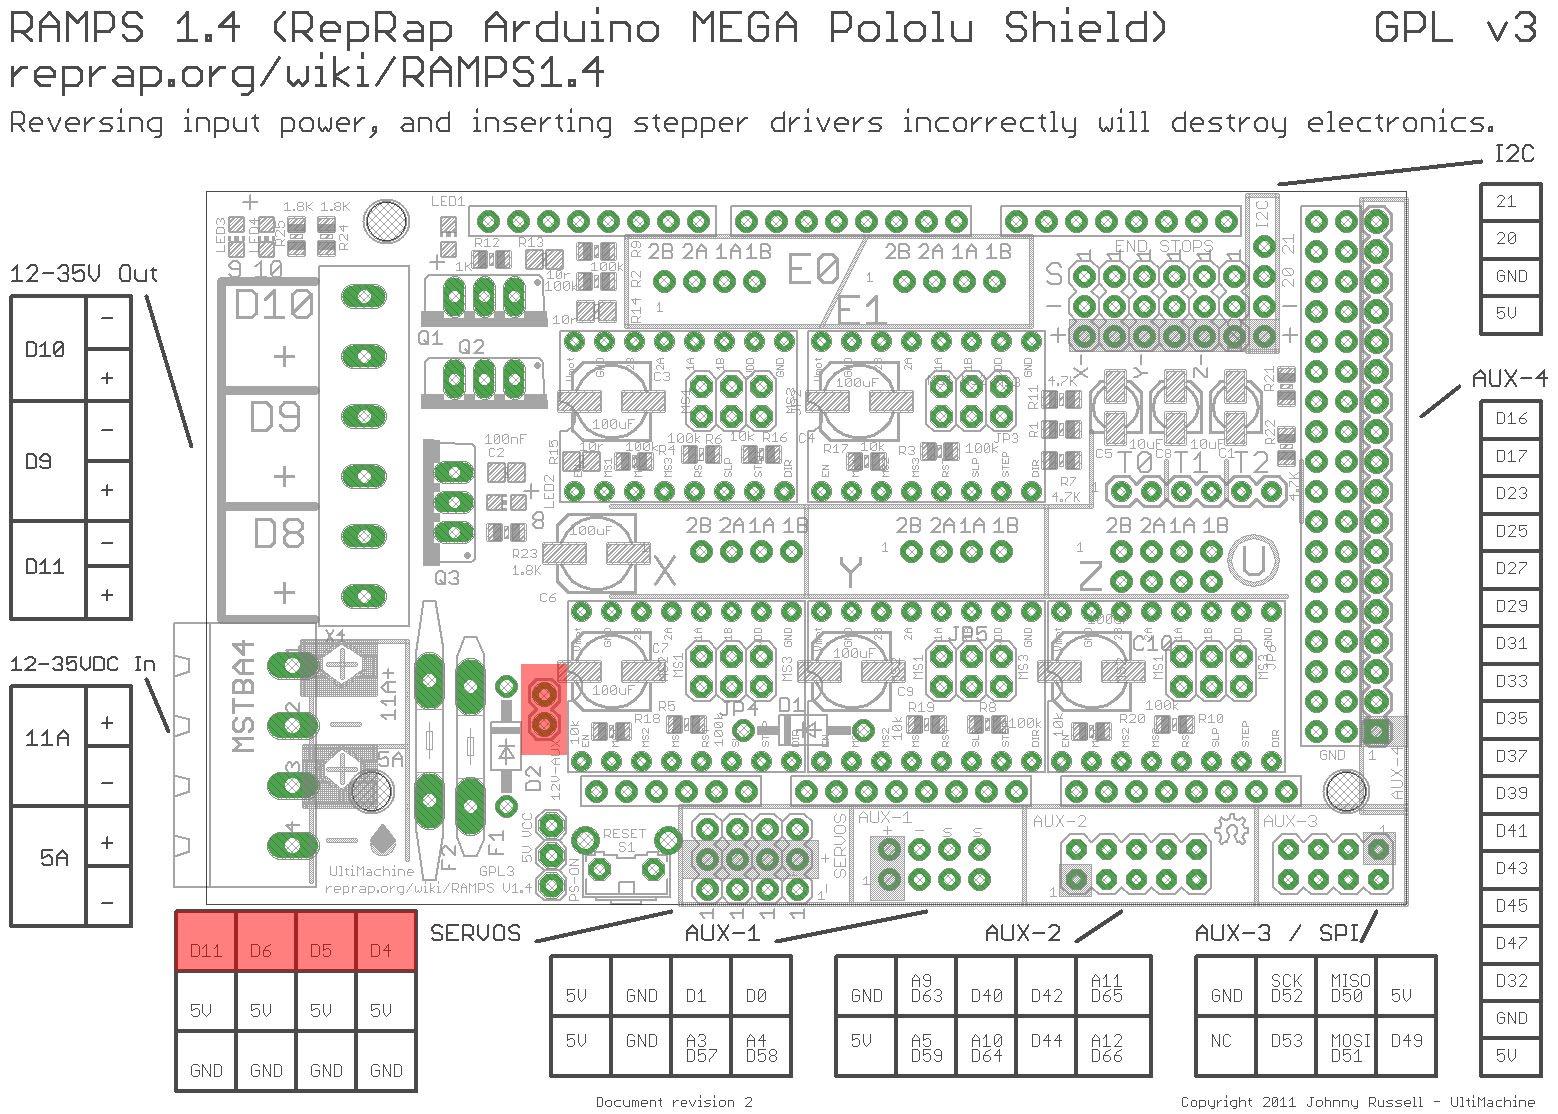 RAMPS 1.4 RepRap Arduino Mega Pololu shield